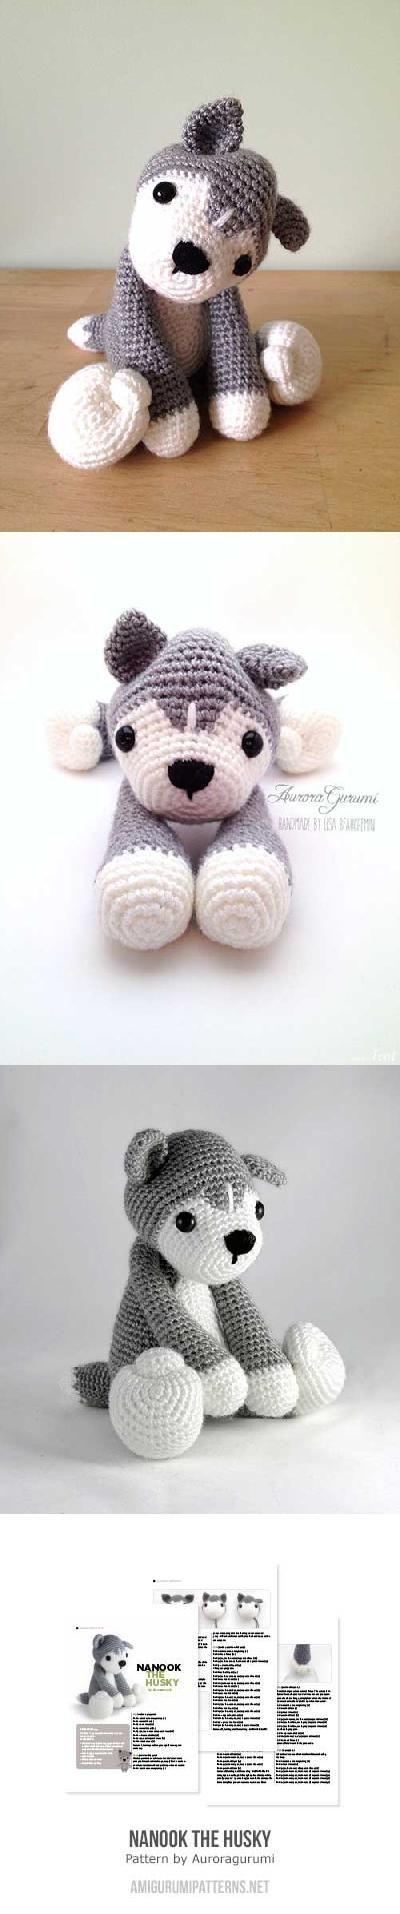 Nanook the husky amigurumi pattern by AuroraGurumi   Patrones ...